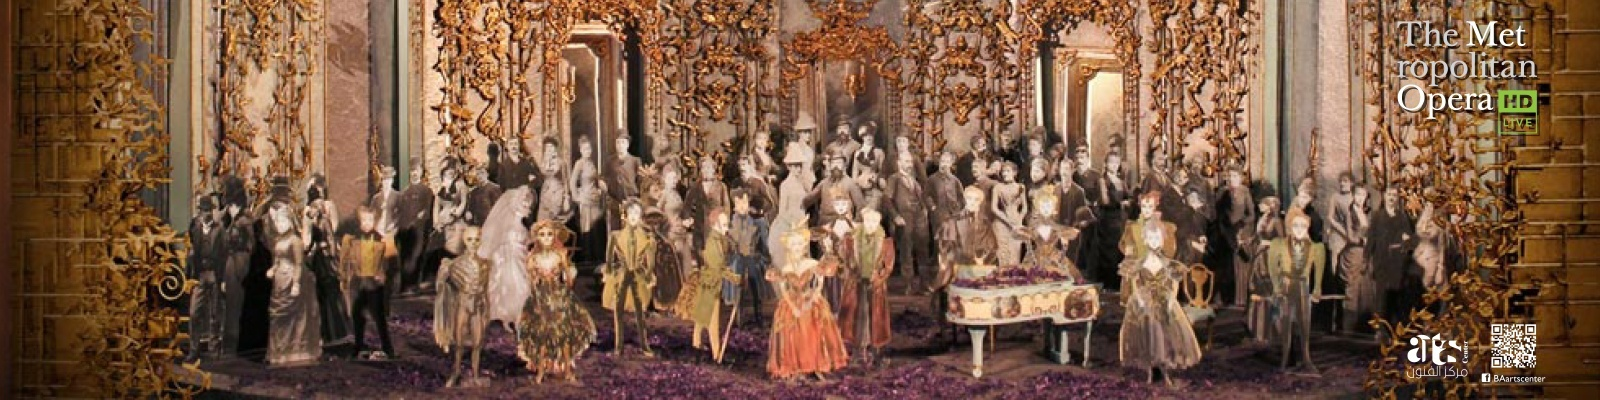 Metropolitan Opera (Live in HD): <i>La Traviata</i>